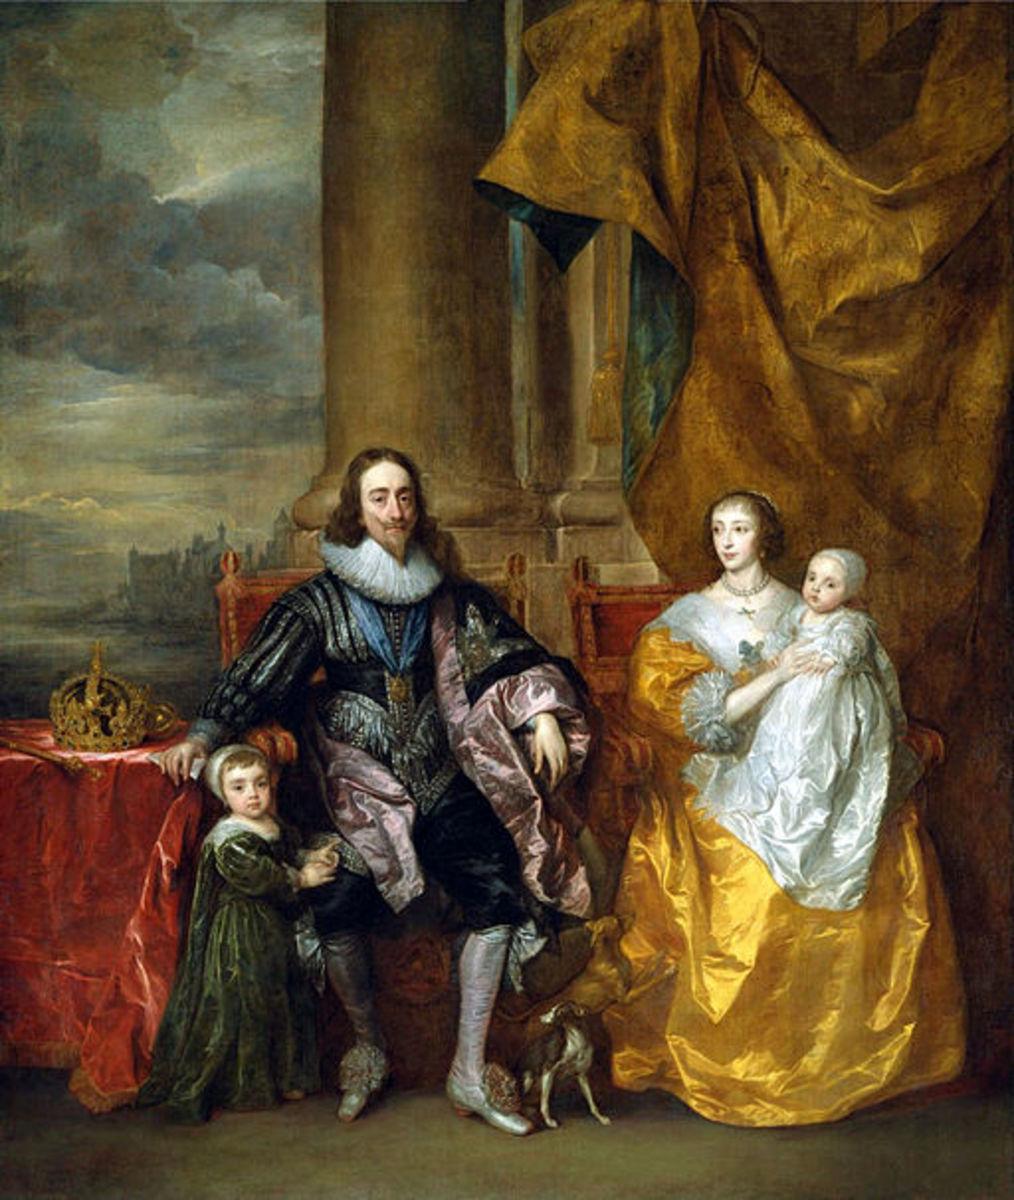 King Charles I, Henrietta Maria and their two eldest children